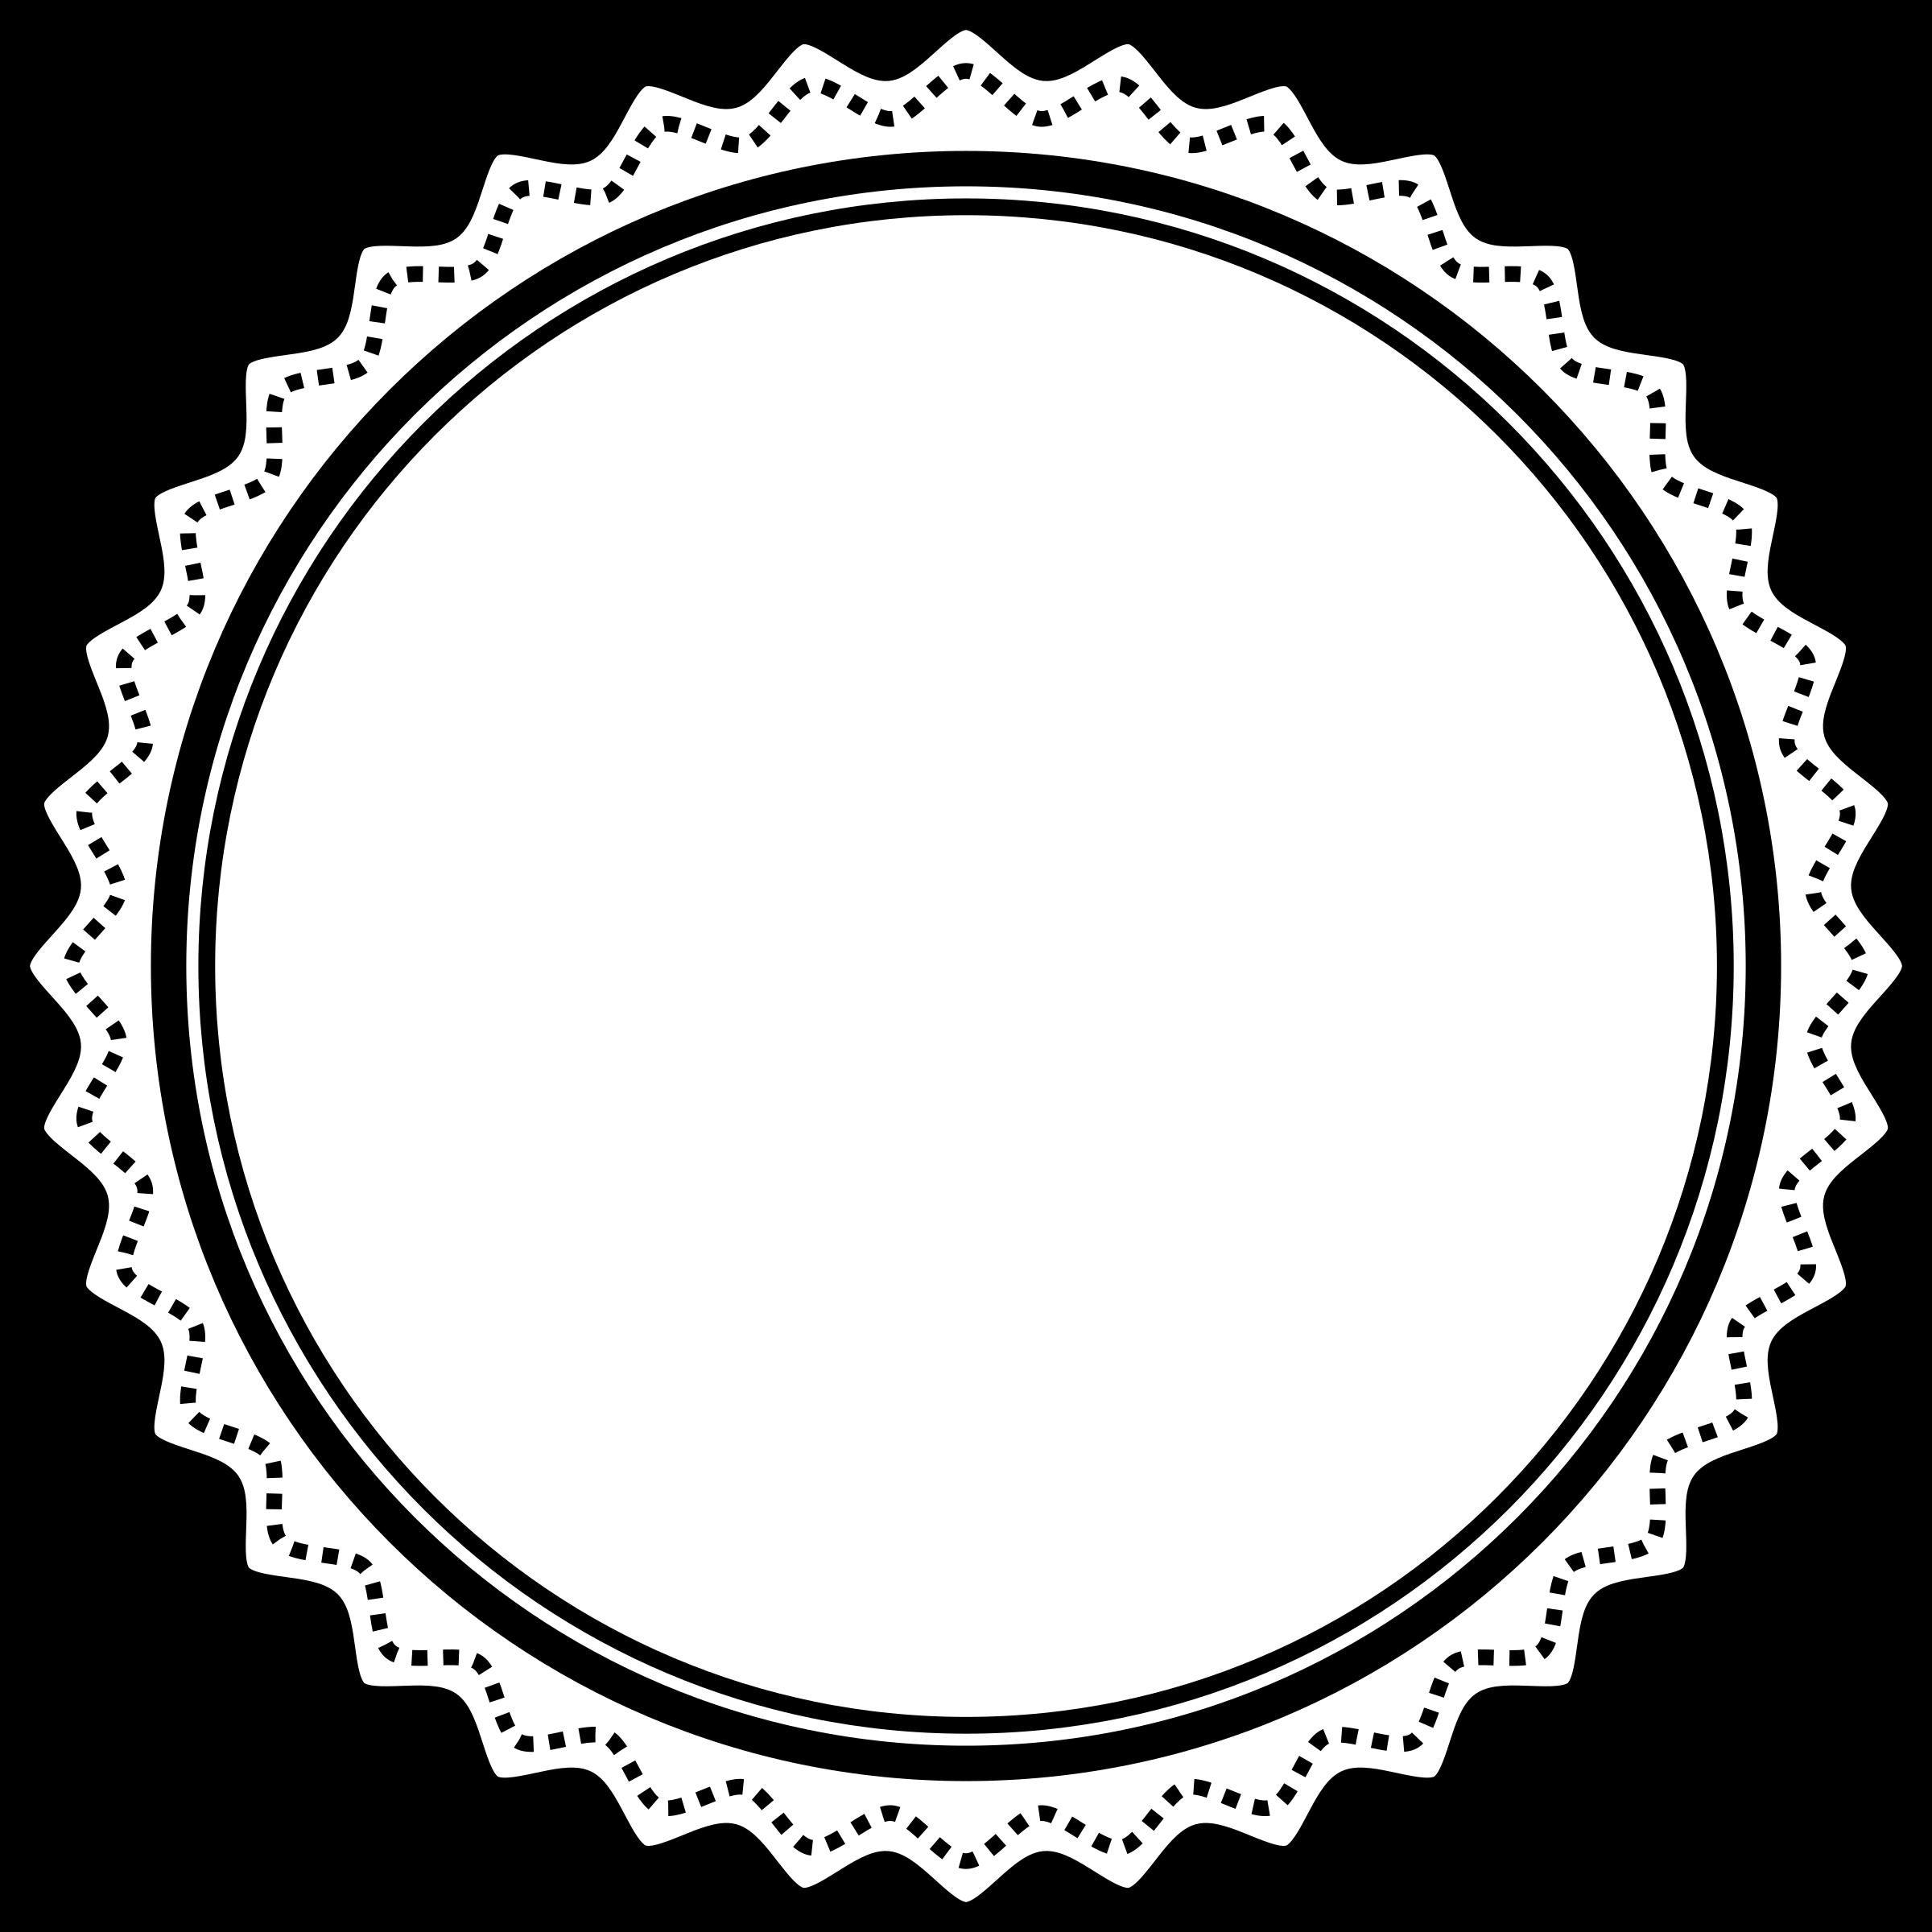 Circle clipart badge. Fancy big image png